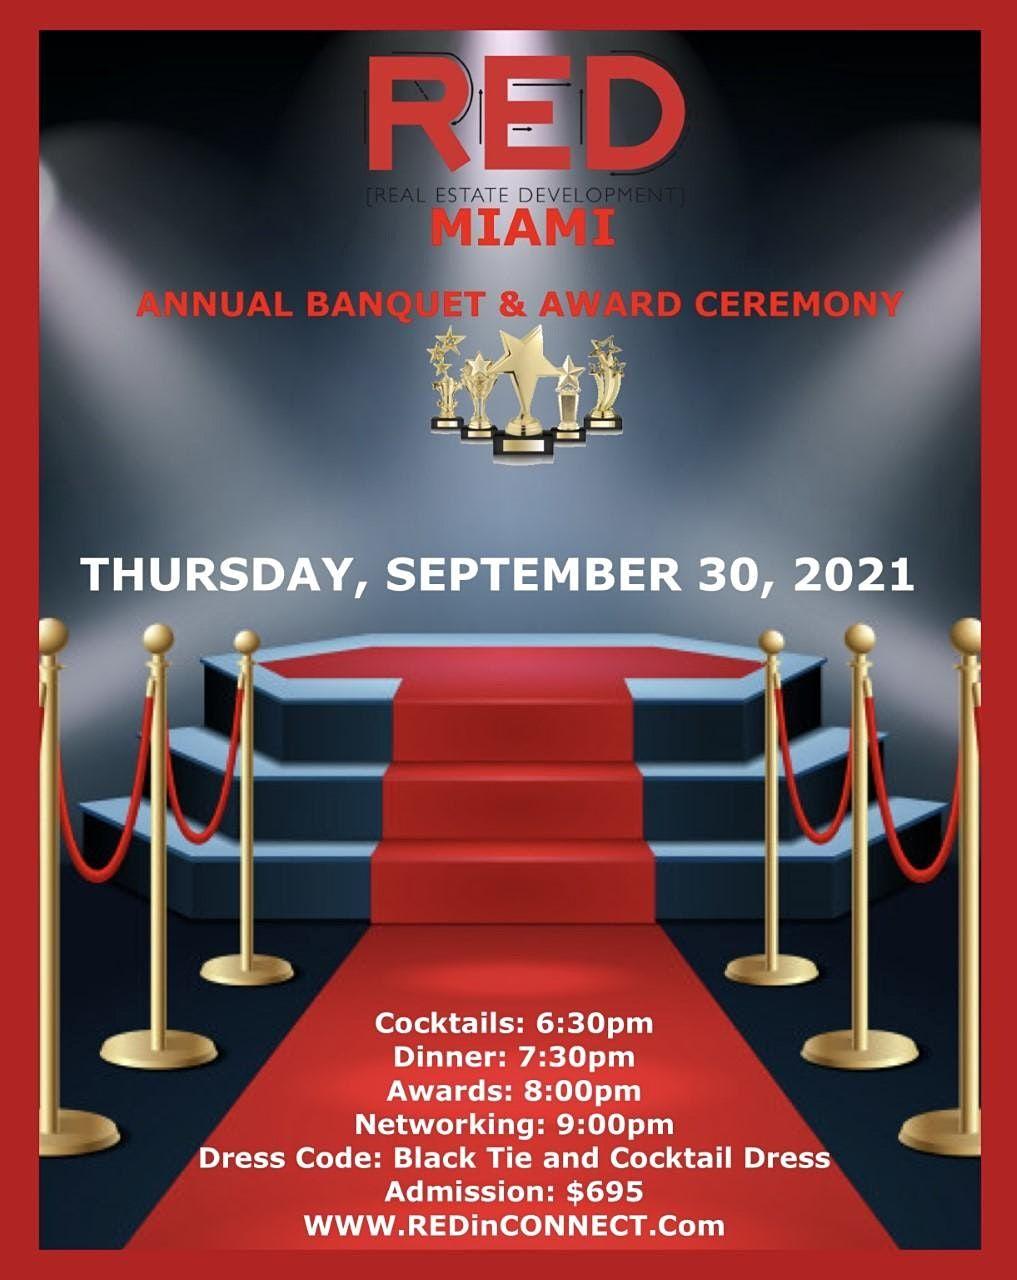 RED Miami, Awards Ceremony